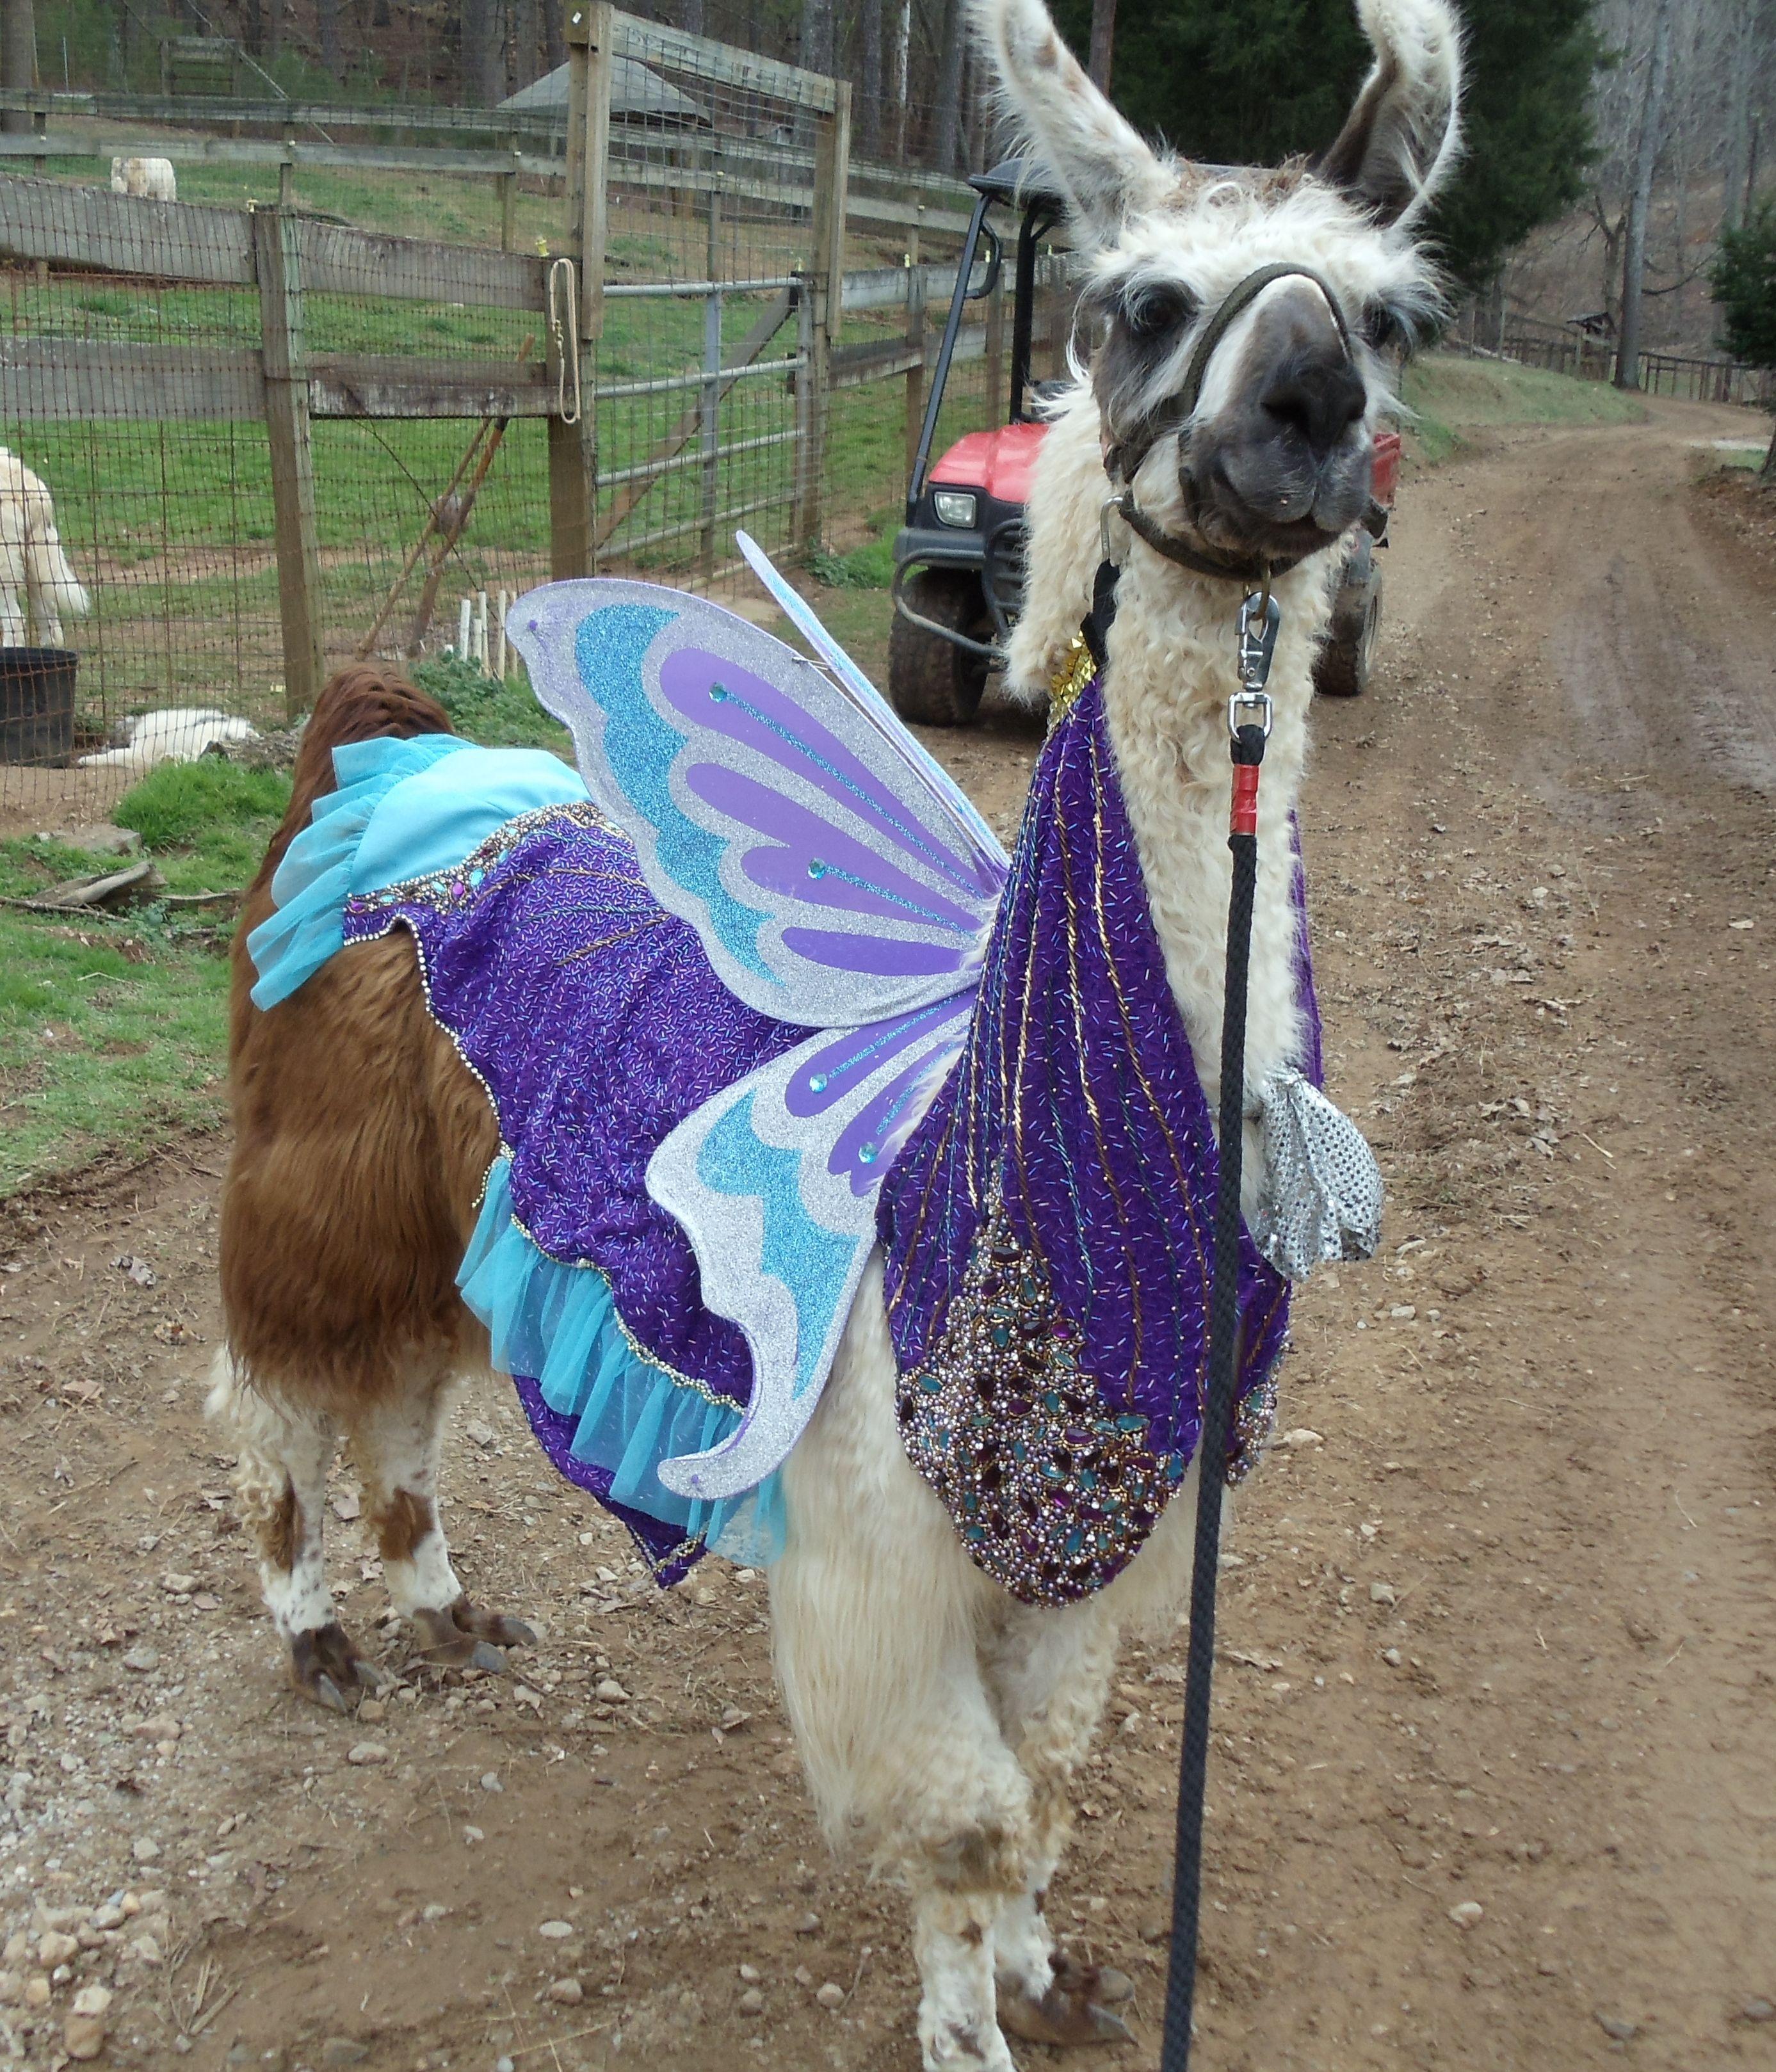 Llama Twist Purple Glass Butterfly Parade Costume